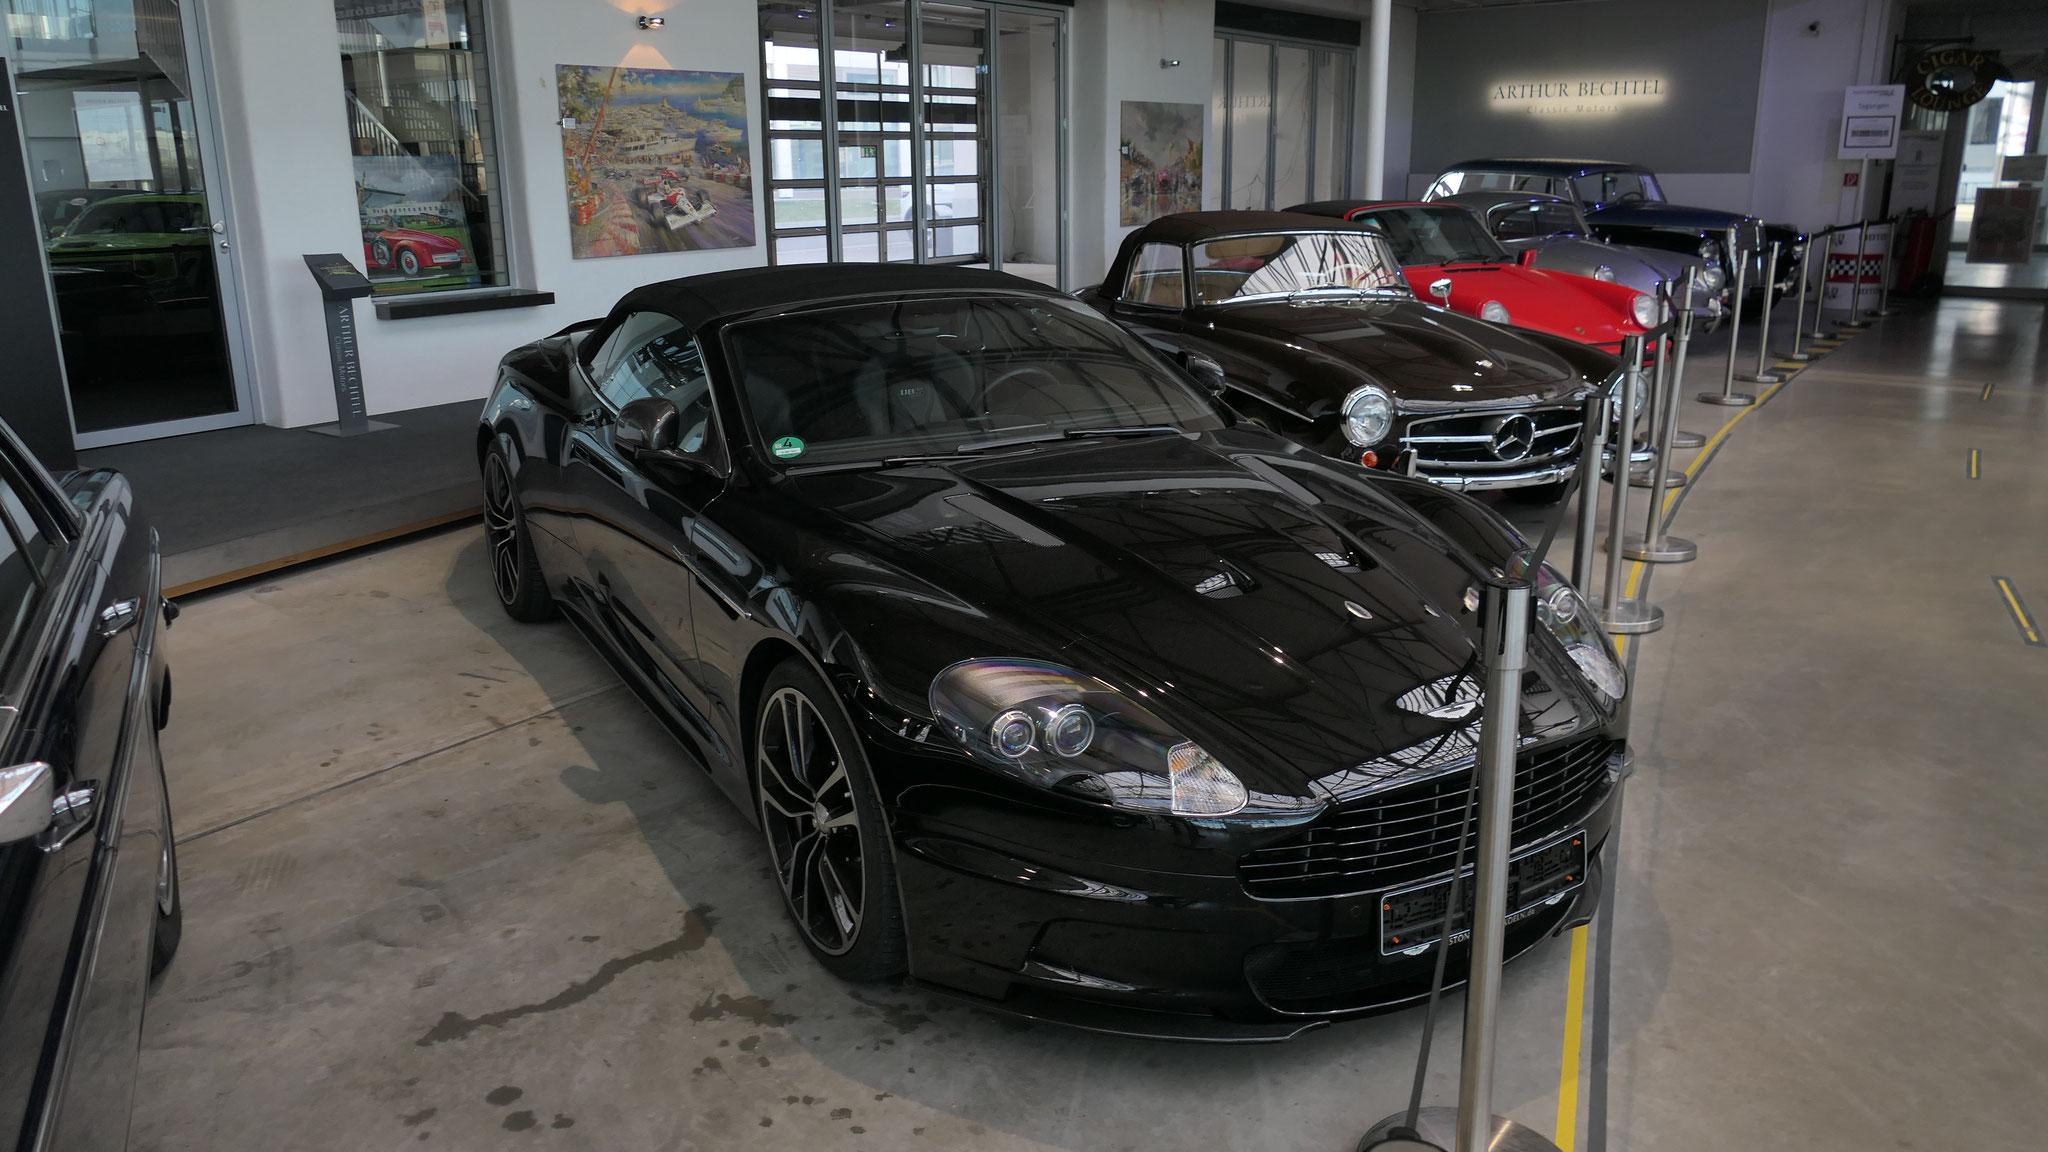 Aston Martin DBS Volante - D-MF-501